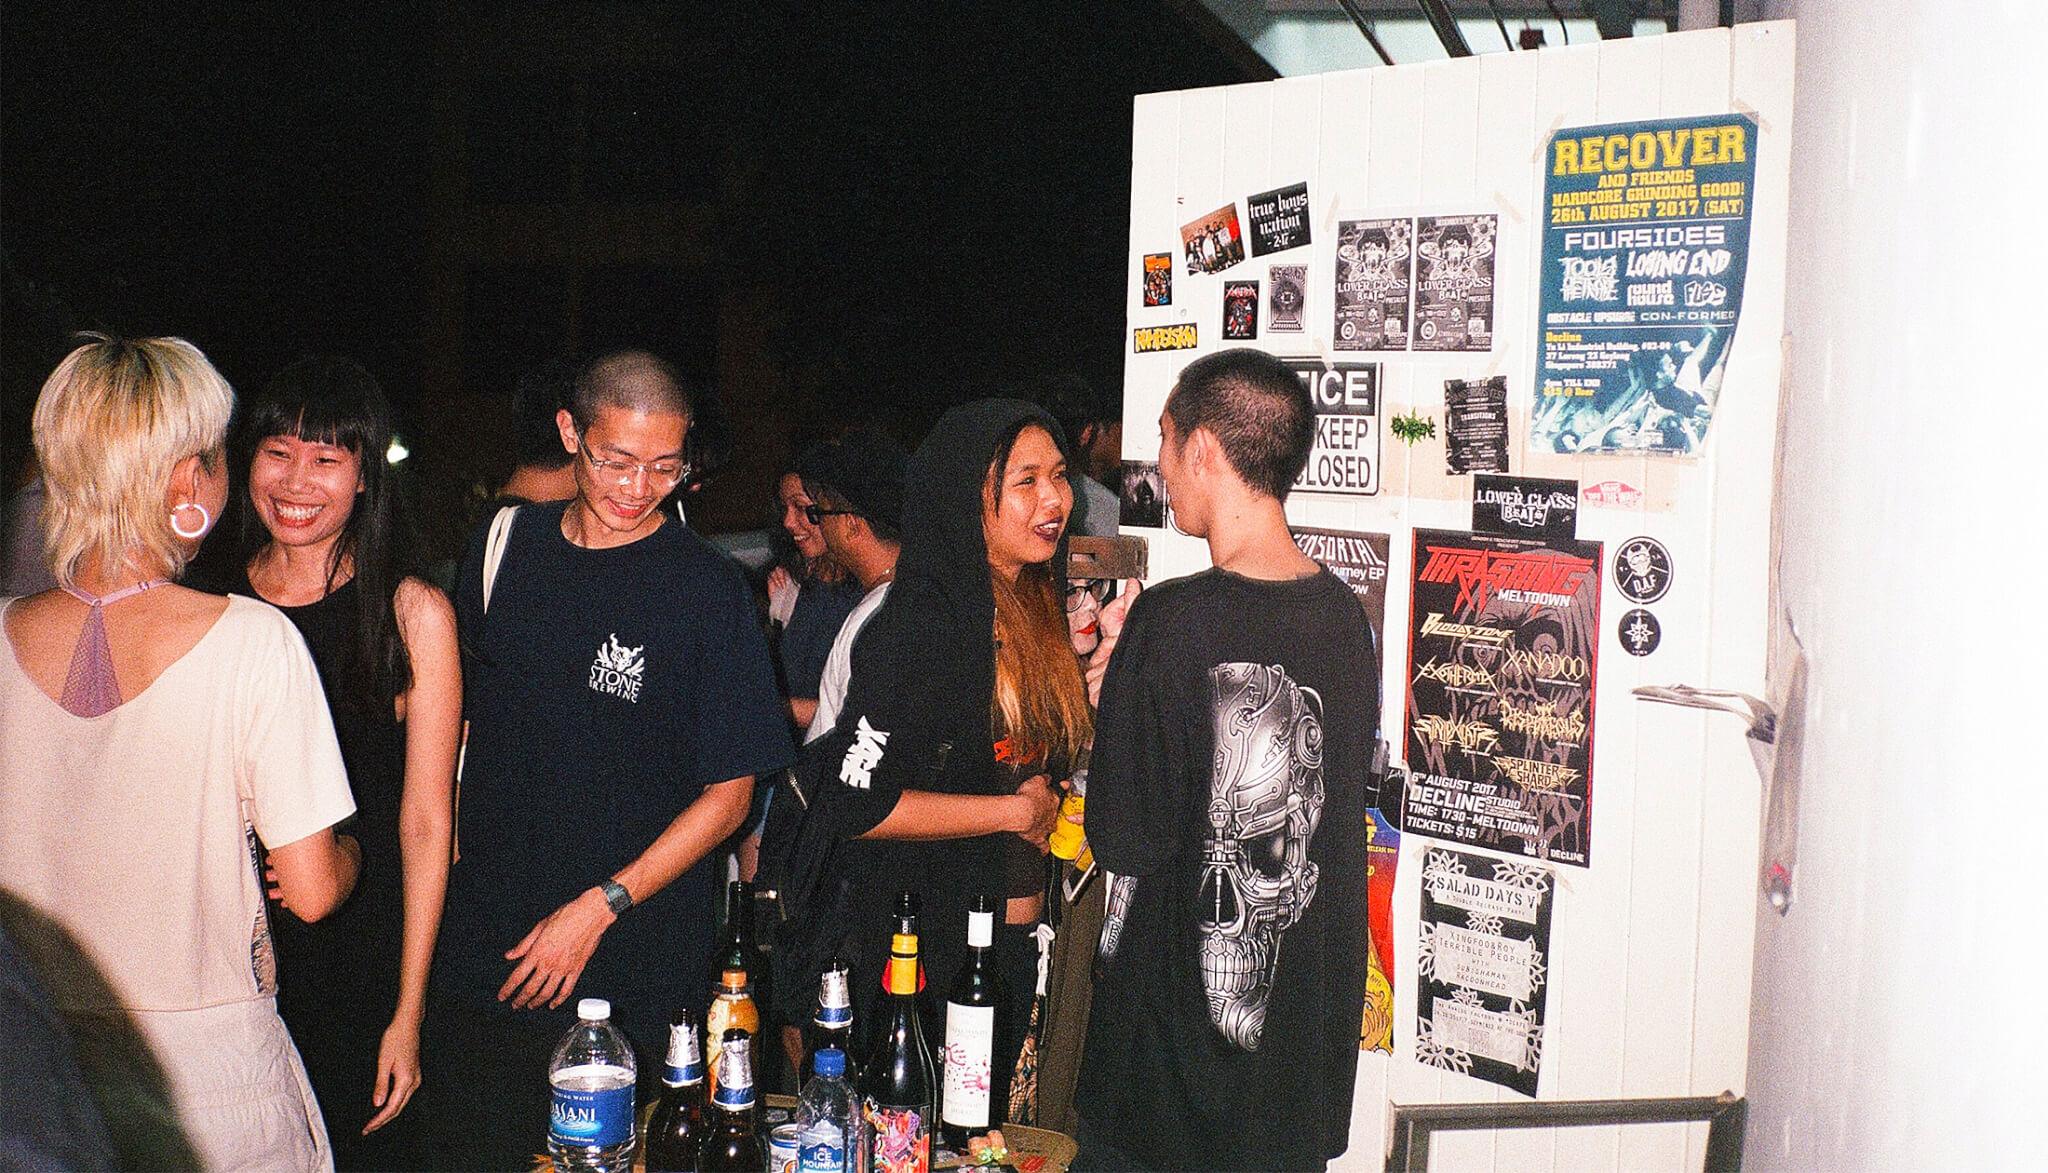 Inside the Singapore rave scene